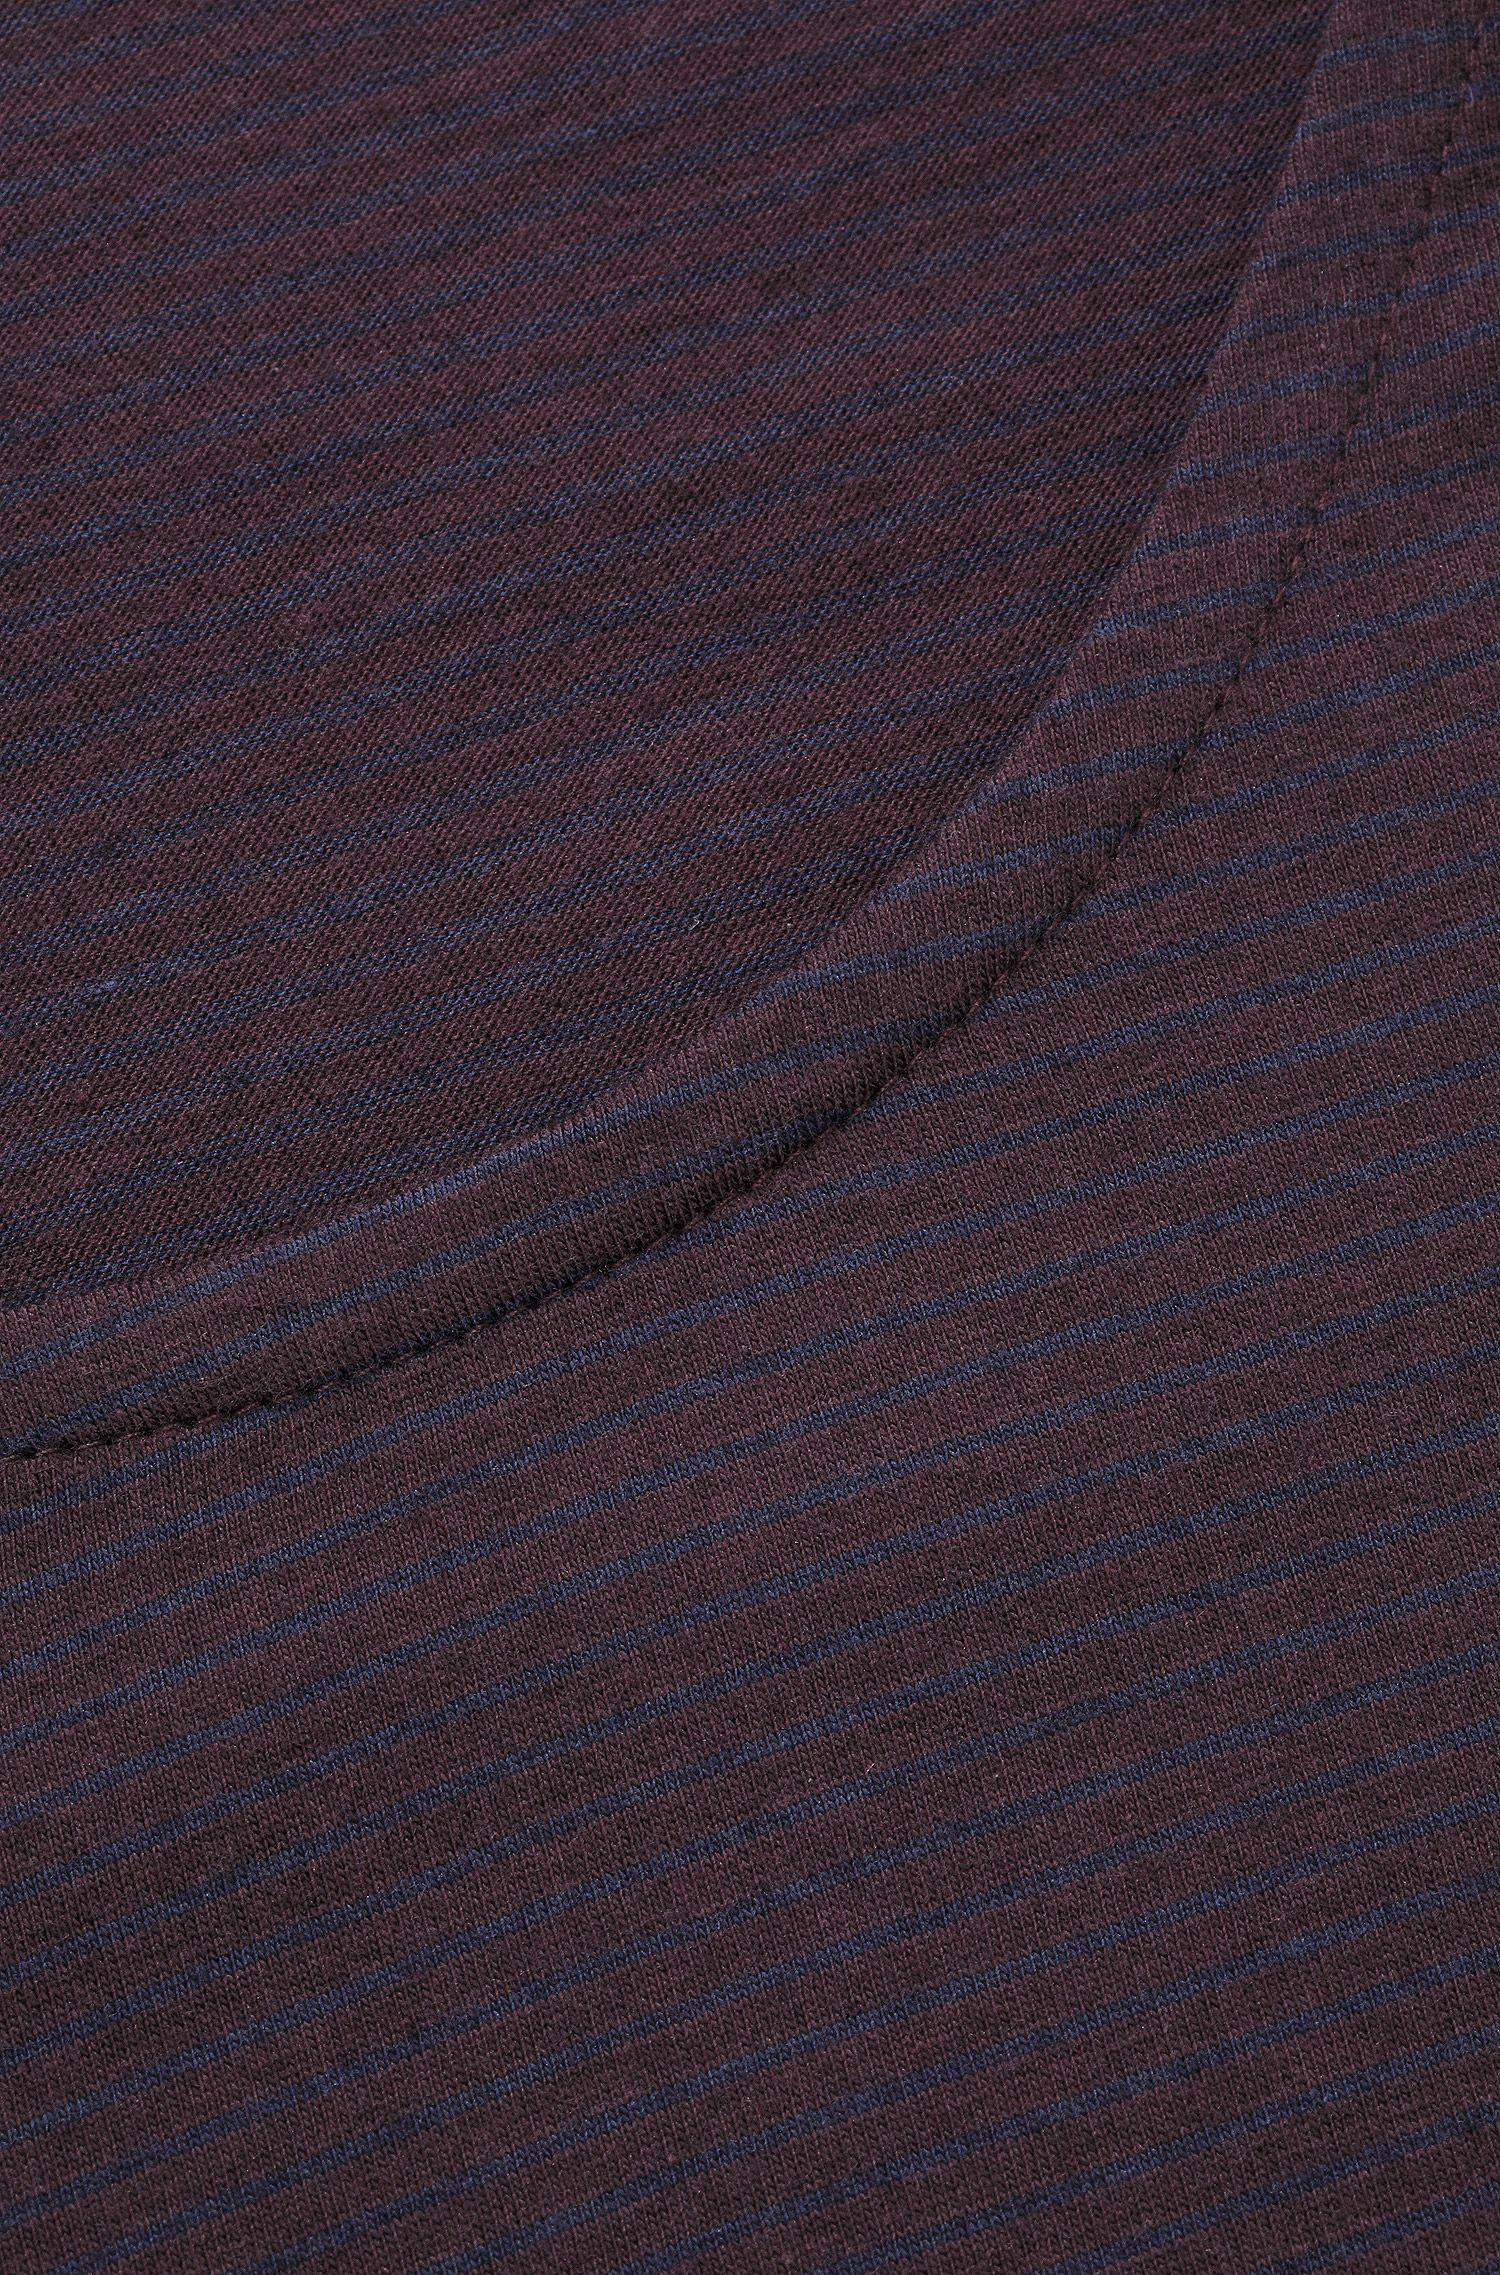 Longsleeve ´Darlone` aus Baumwoll-Mix